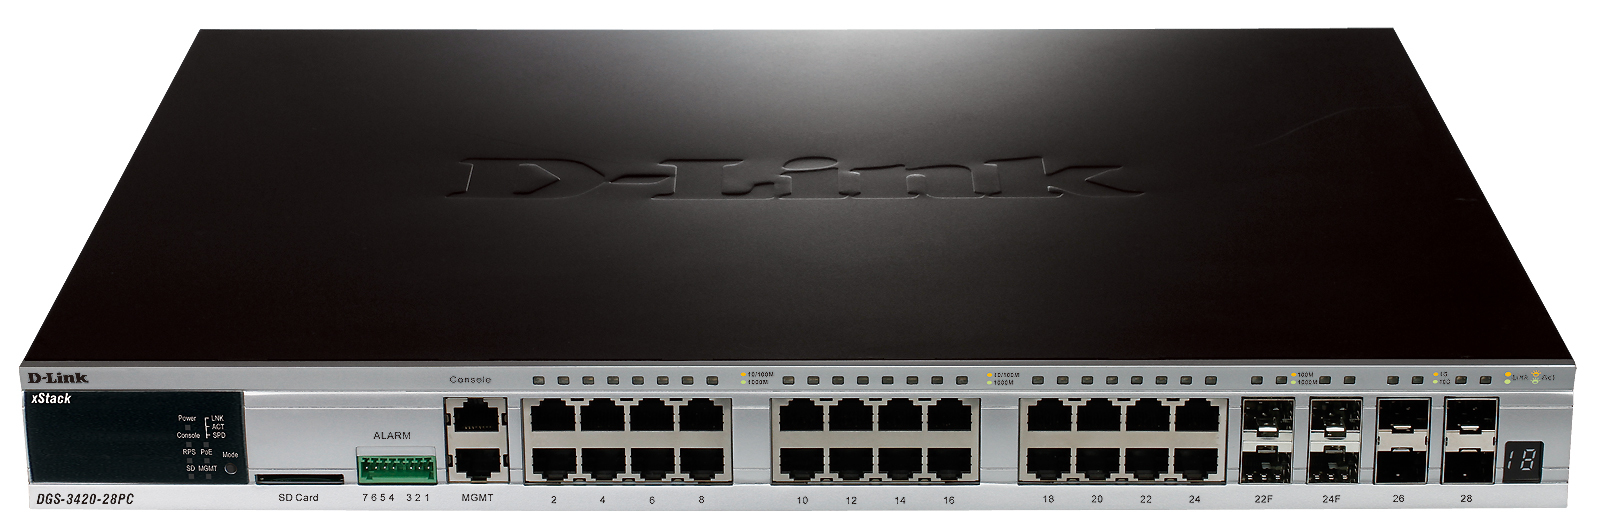 D-Link DGS-3420-28PC network switch